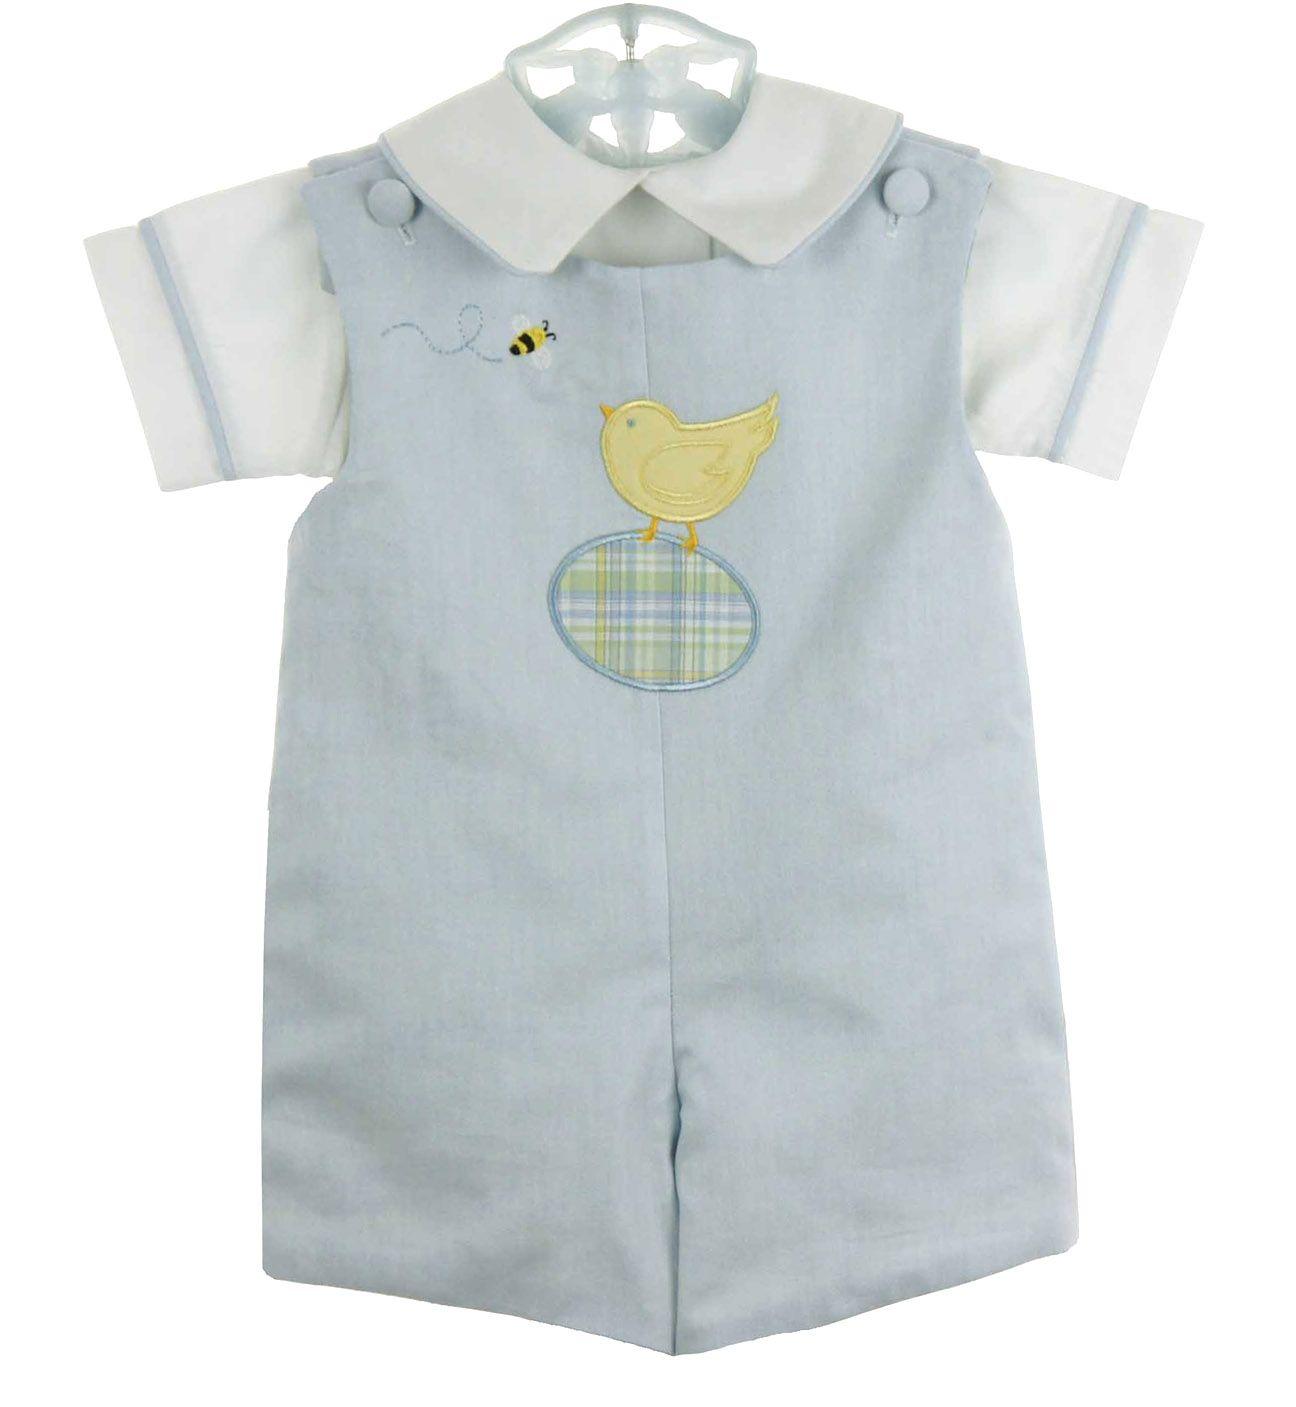 95b346c08c NEW Glorimont Reversible Pale Blue Cotton Oxford Shortall and Shirt ...